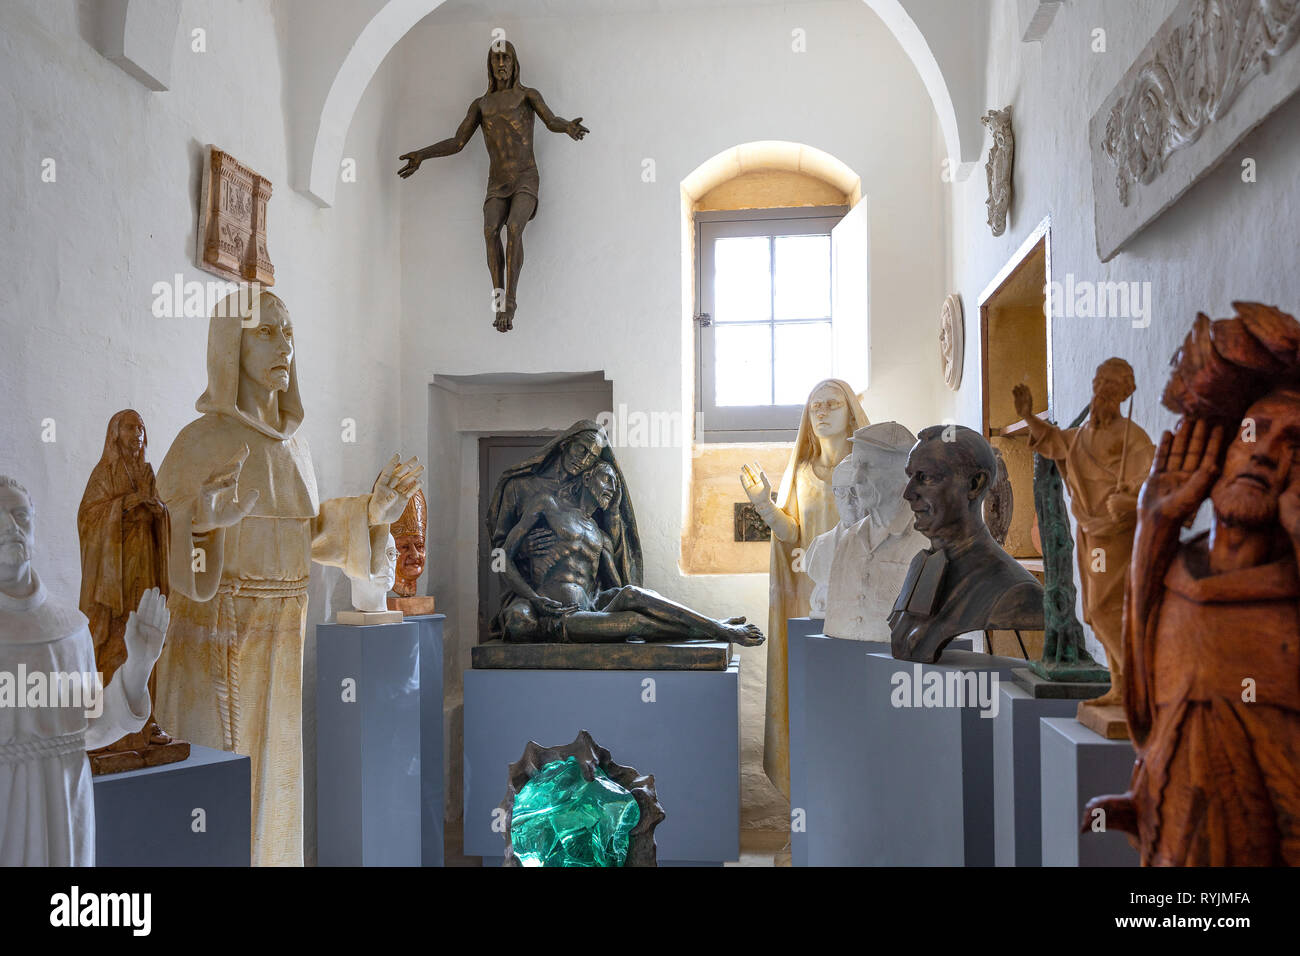 Malta, Rabat, St Paul Church, staues in the Vignacourt exibition - Stock Image